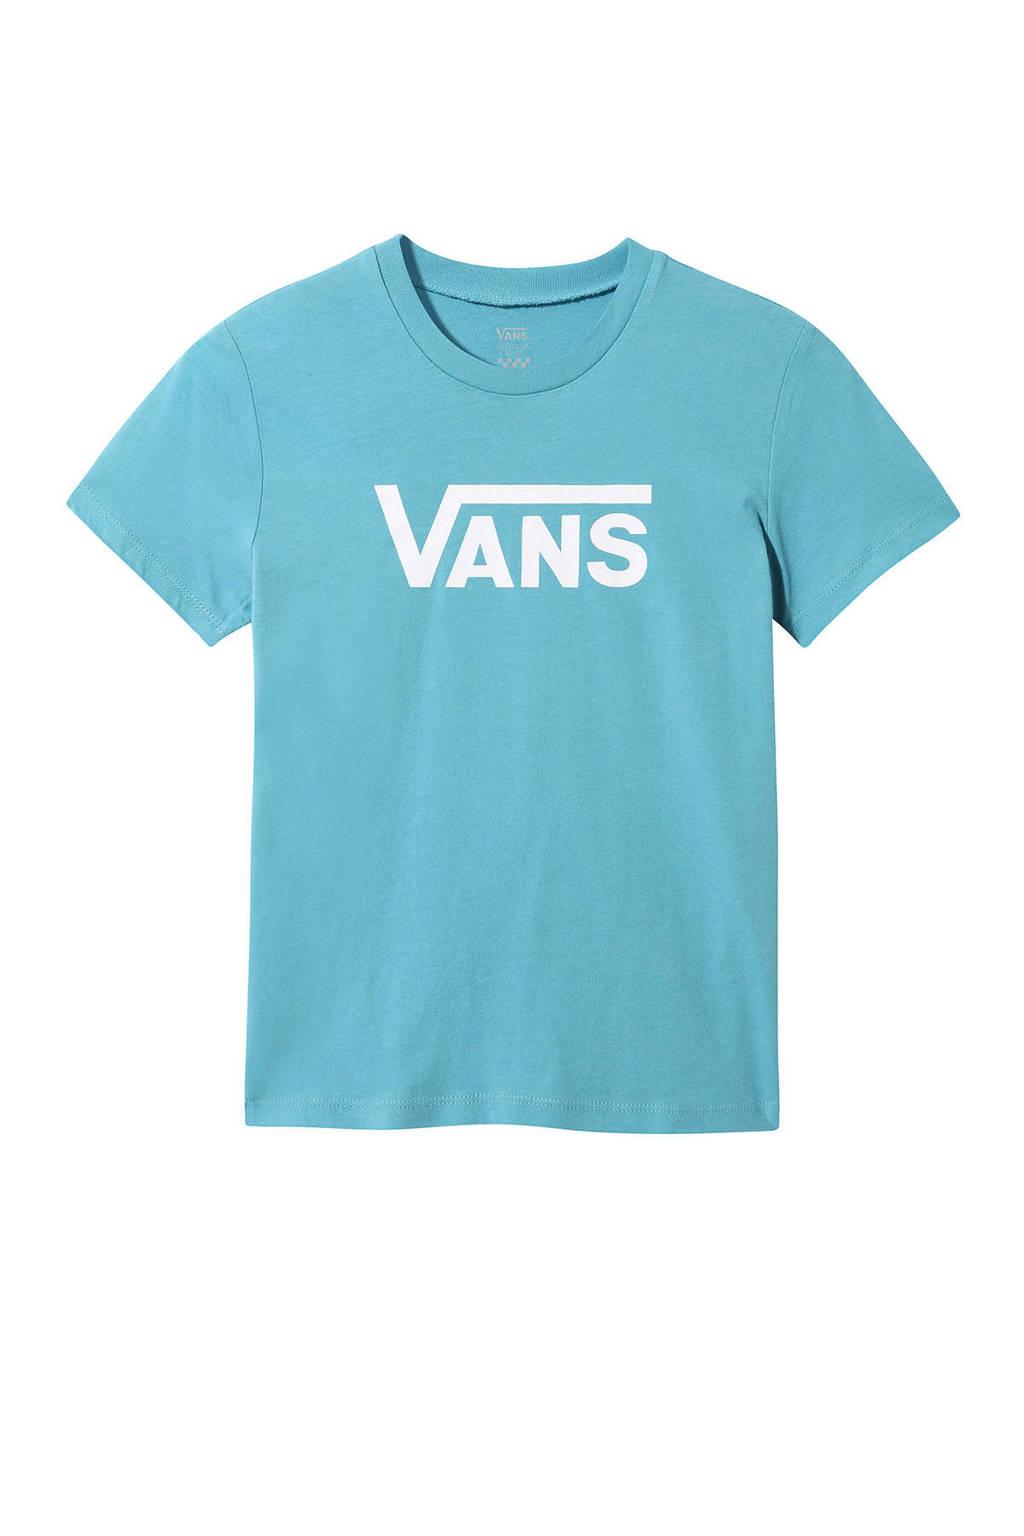 VANS T-shirt blauw, Blauw